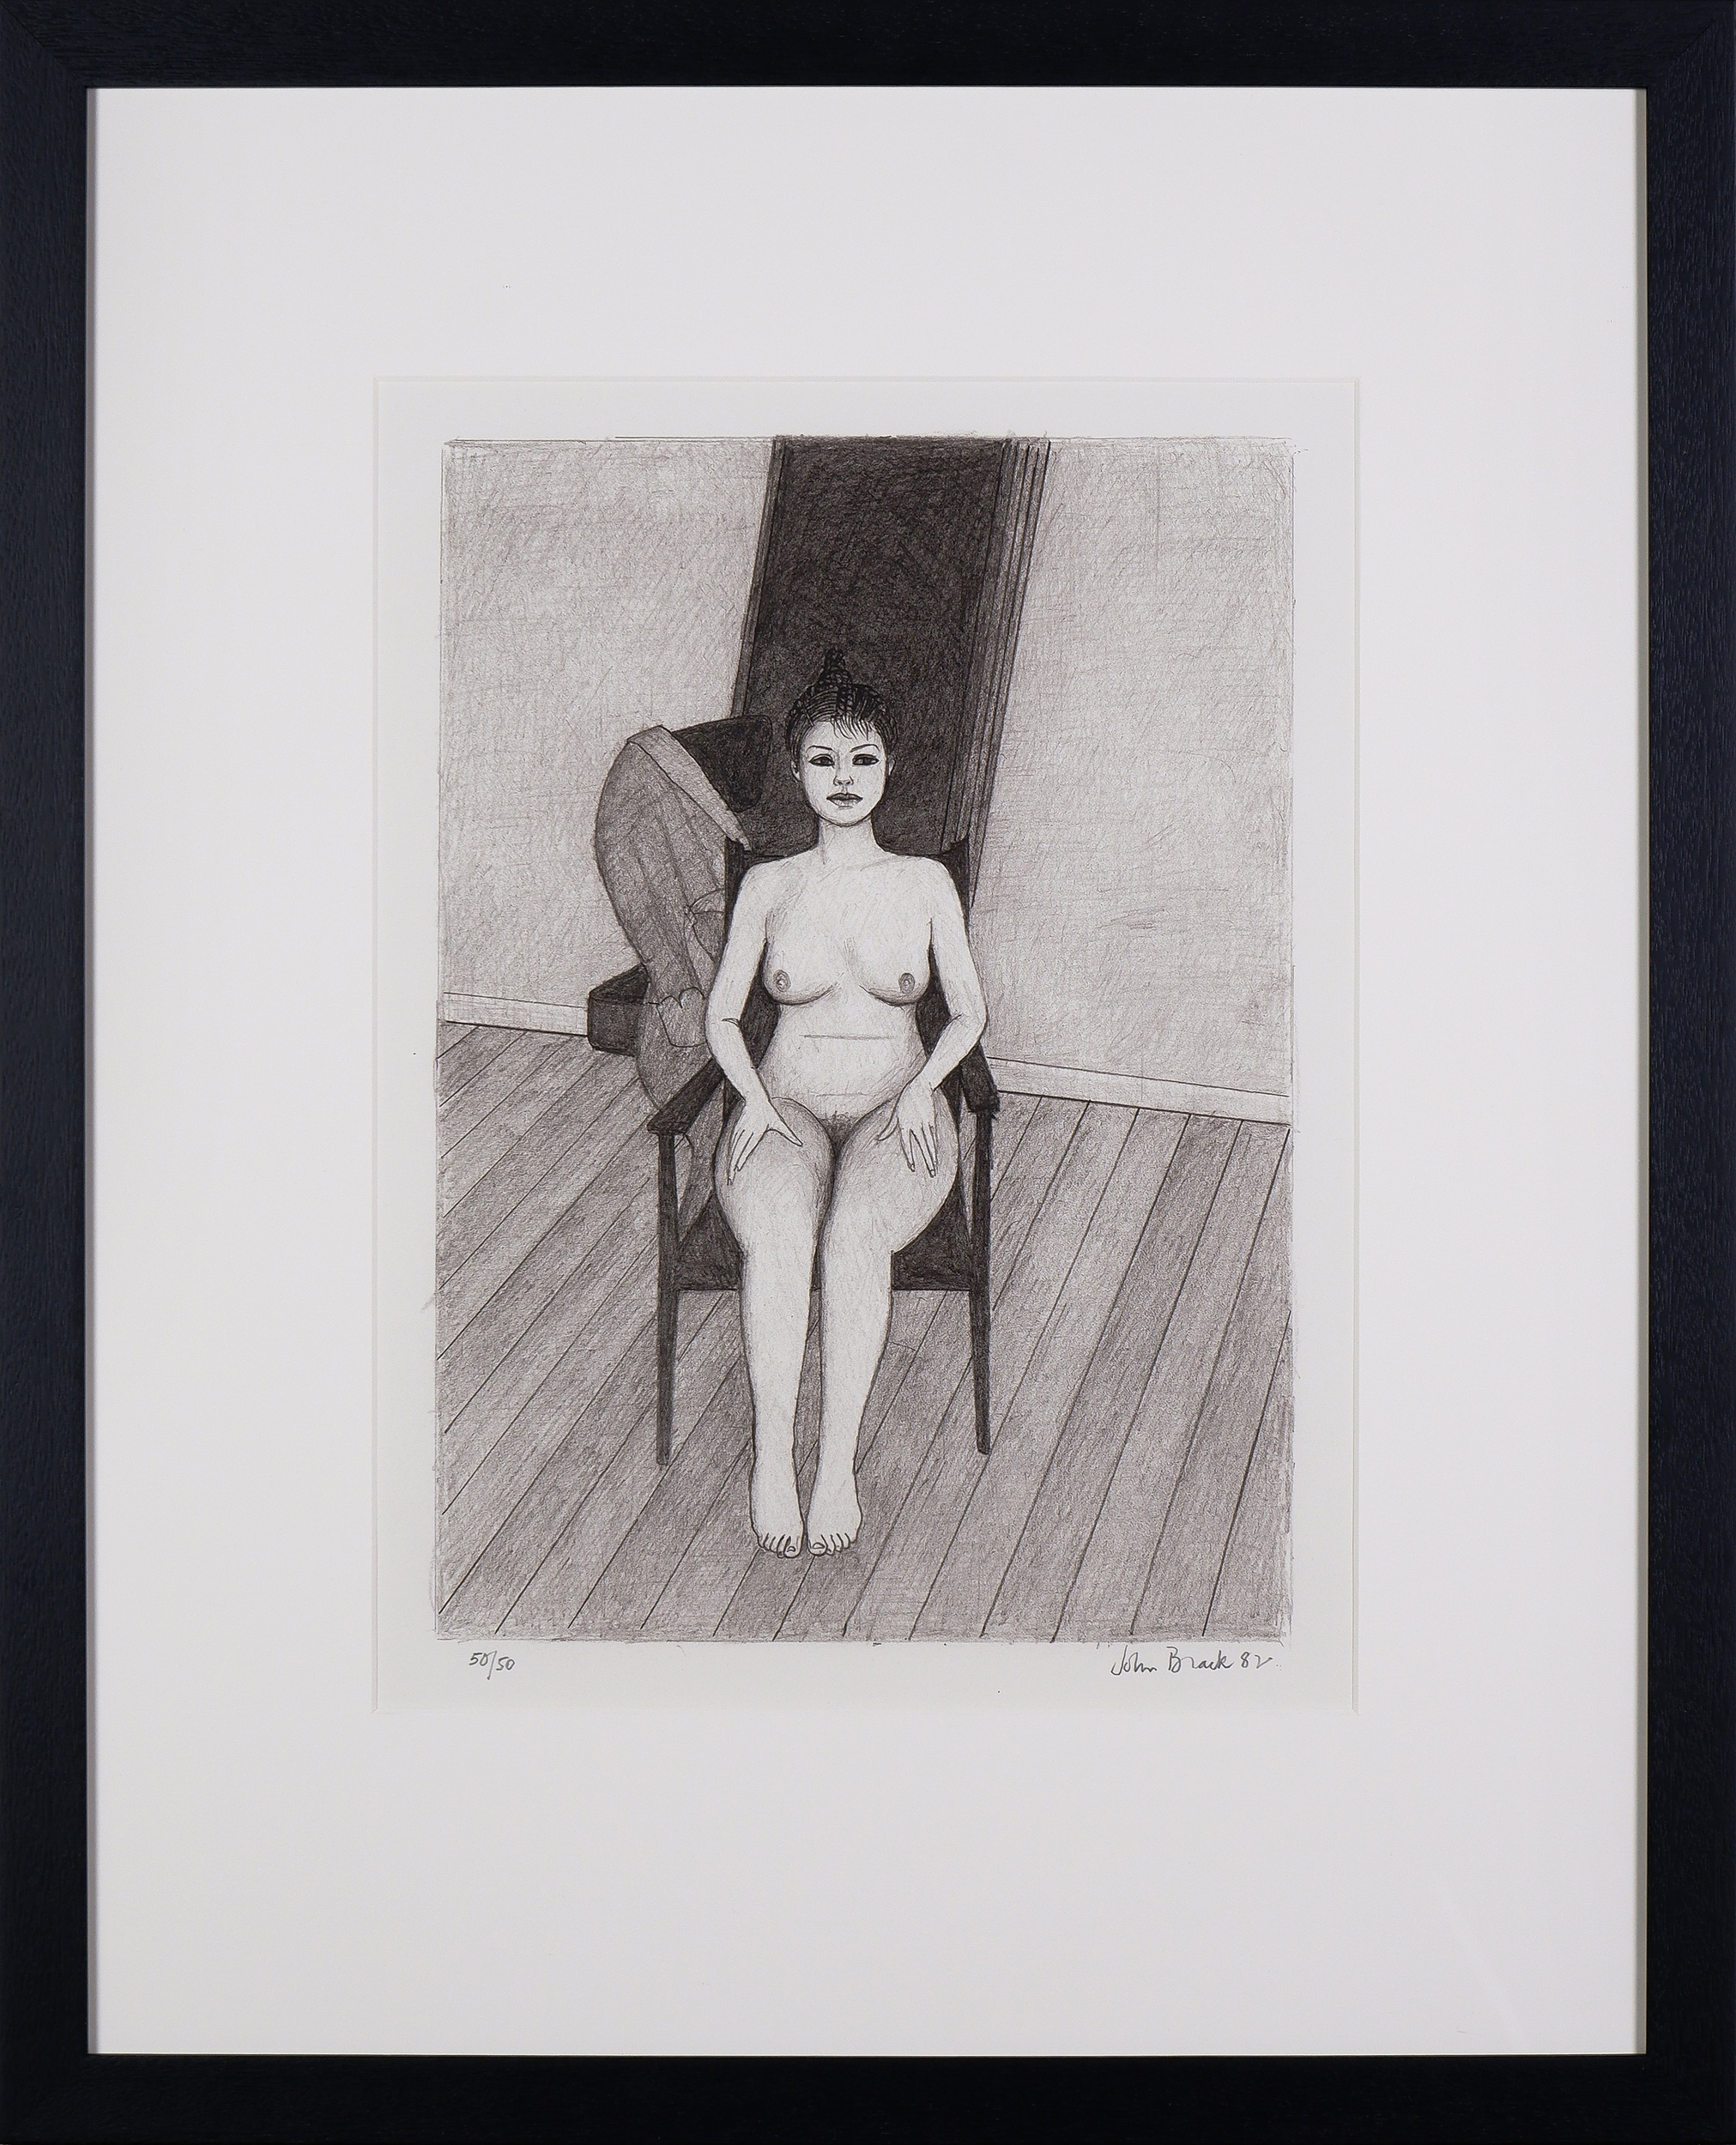 'John Brack (1920-1999), Seated Nude 1982, Lithograph'